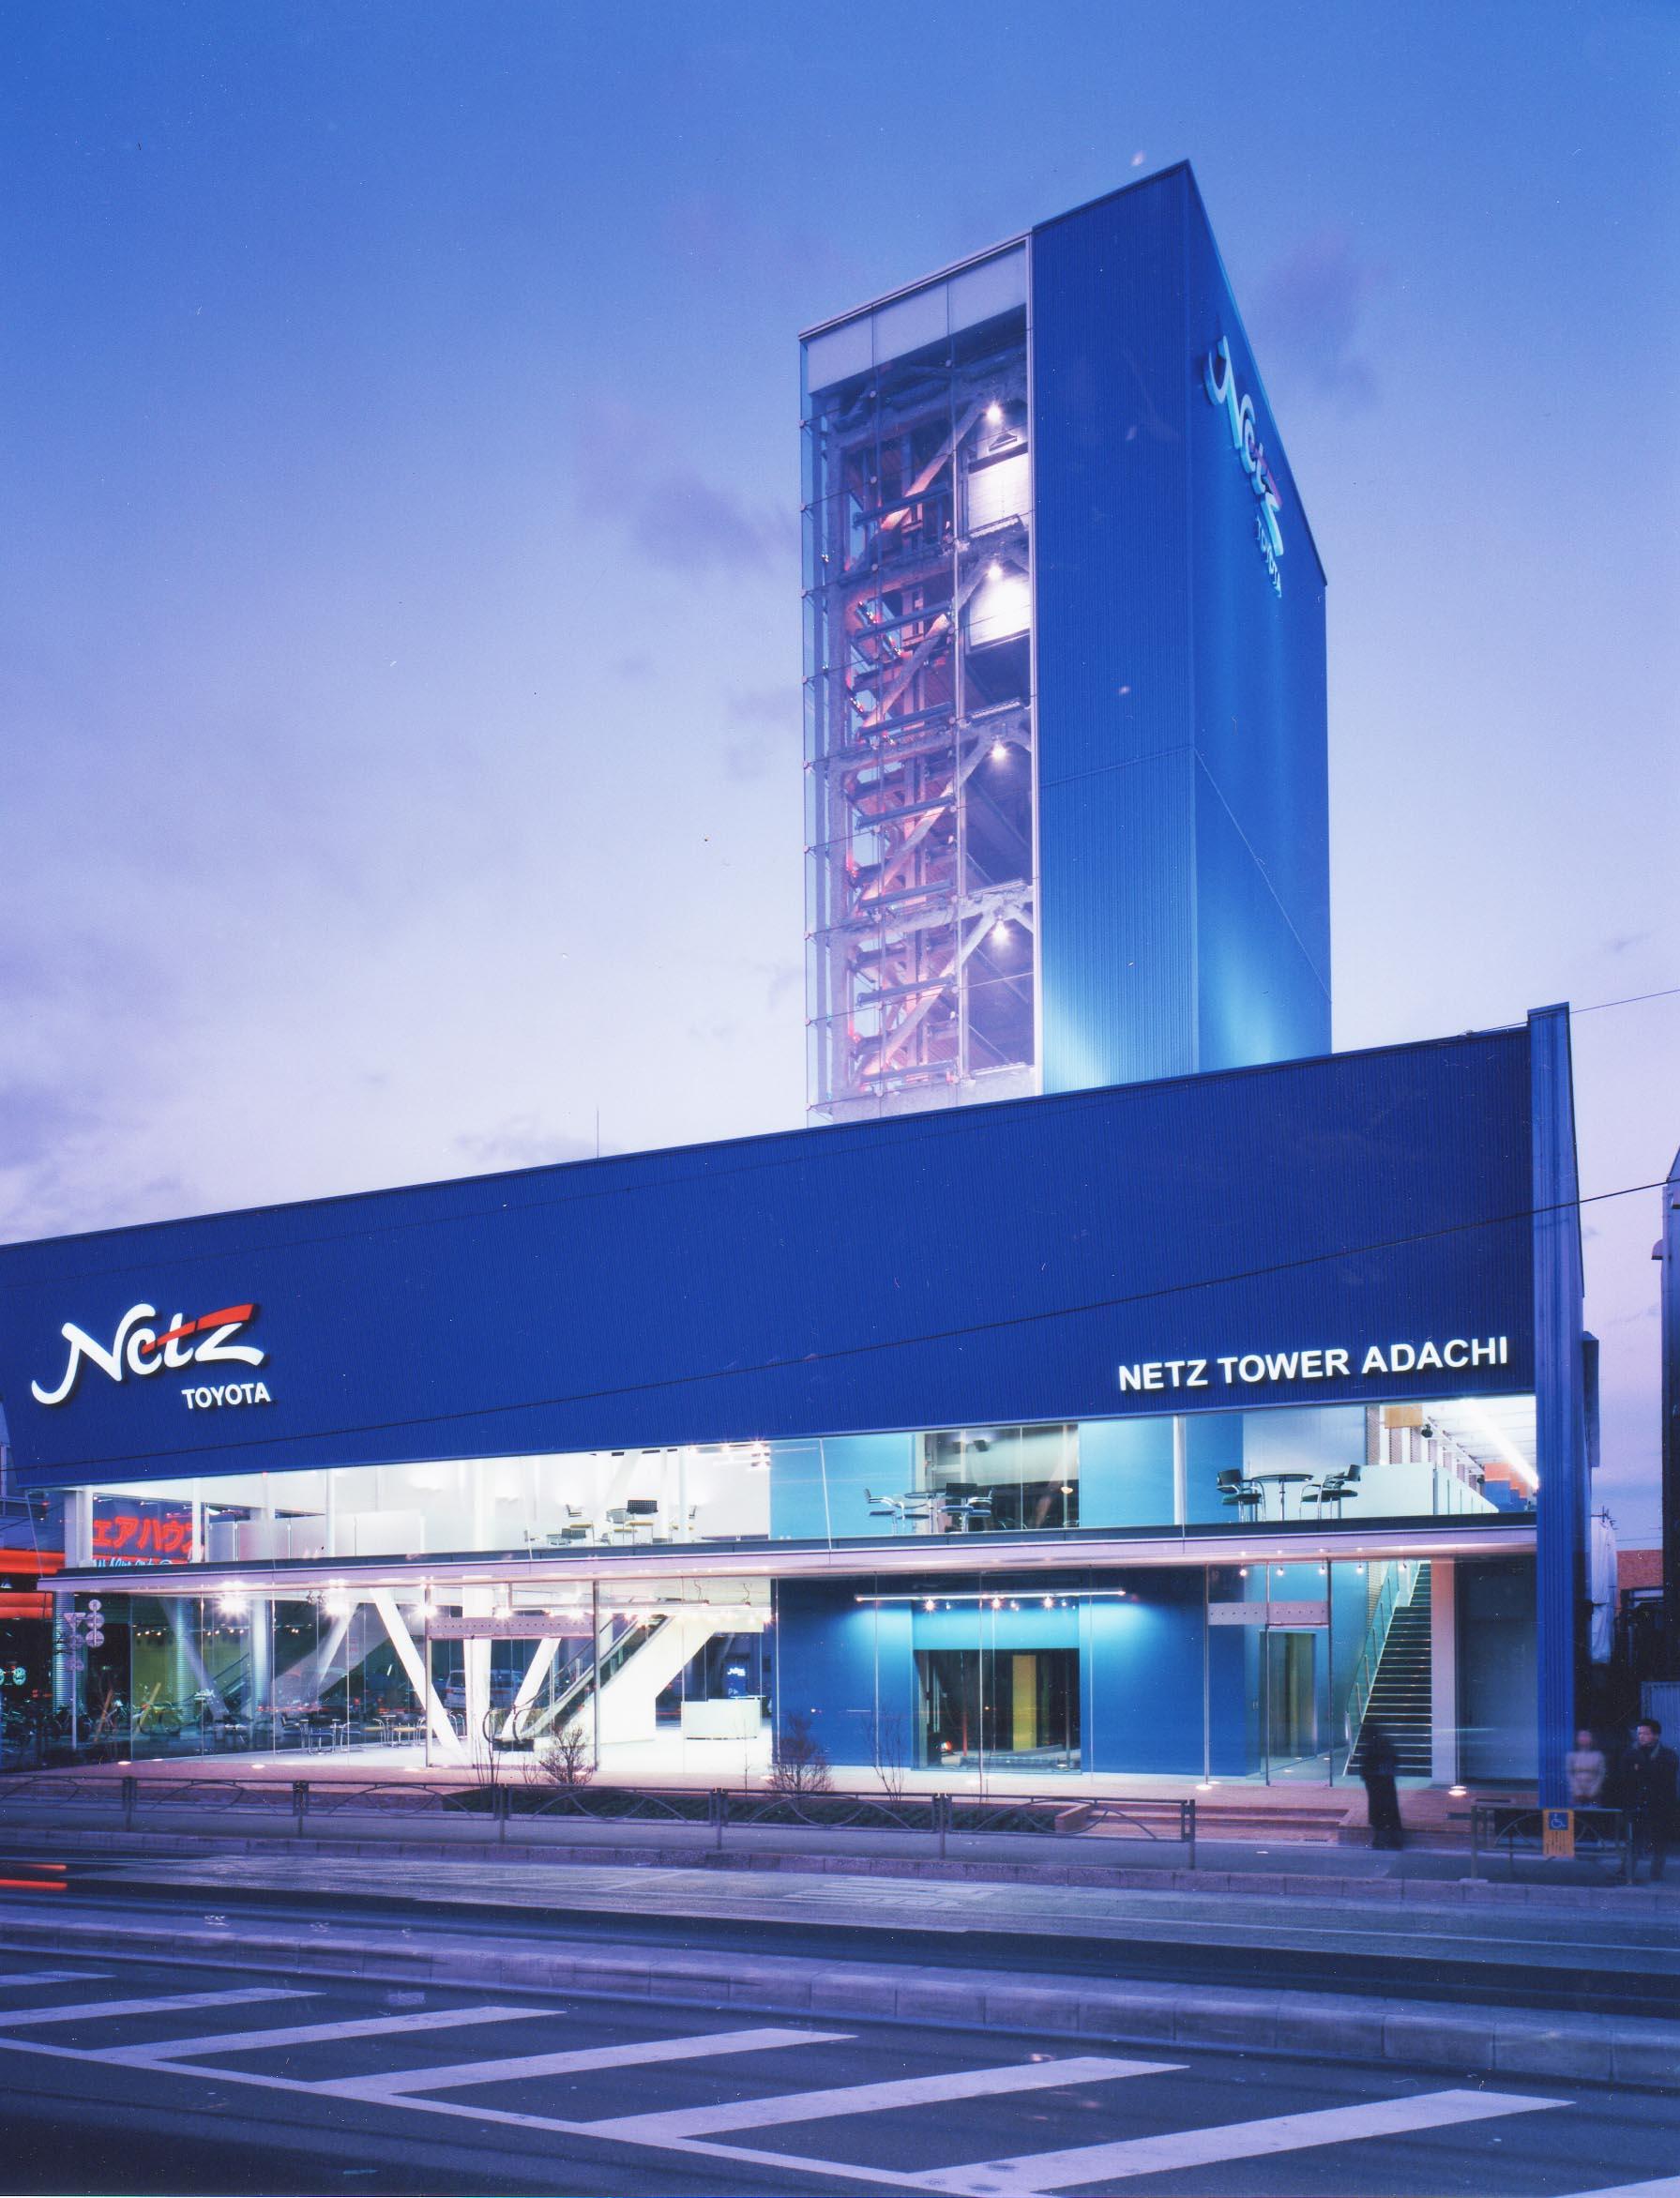 NETZ TOWER ADACHI